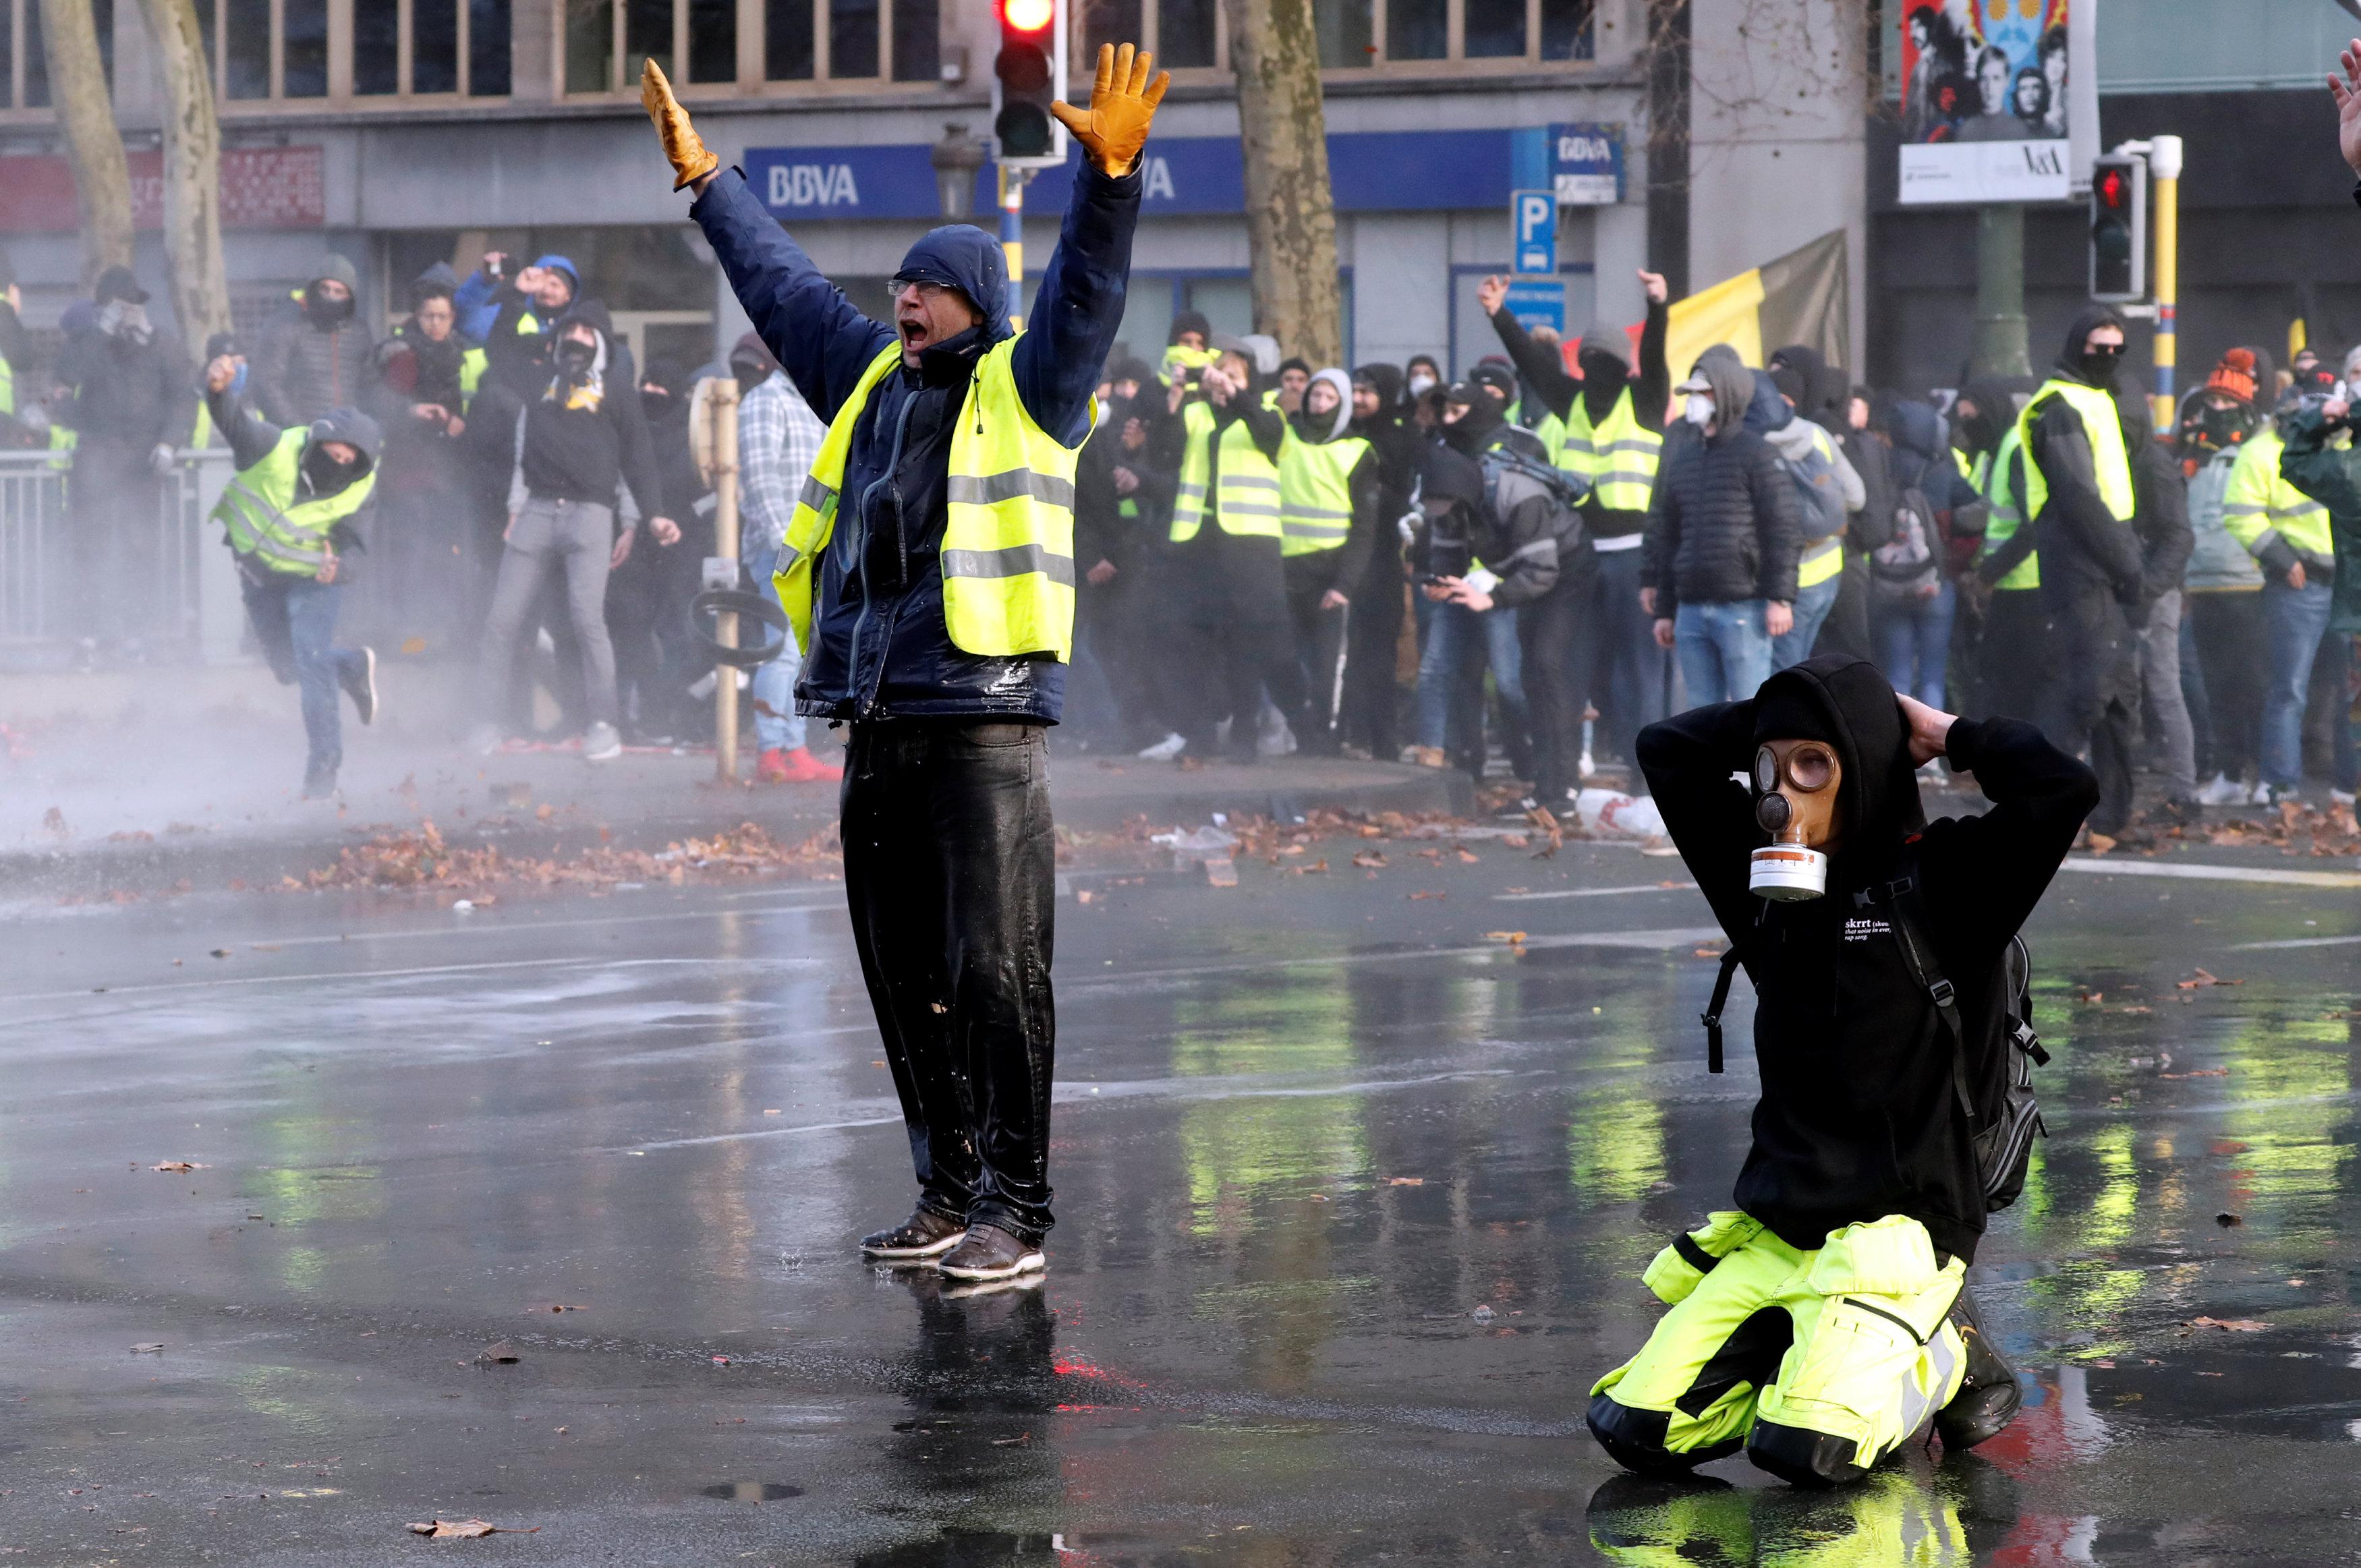 مظاهرات فى بروكسل